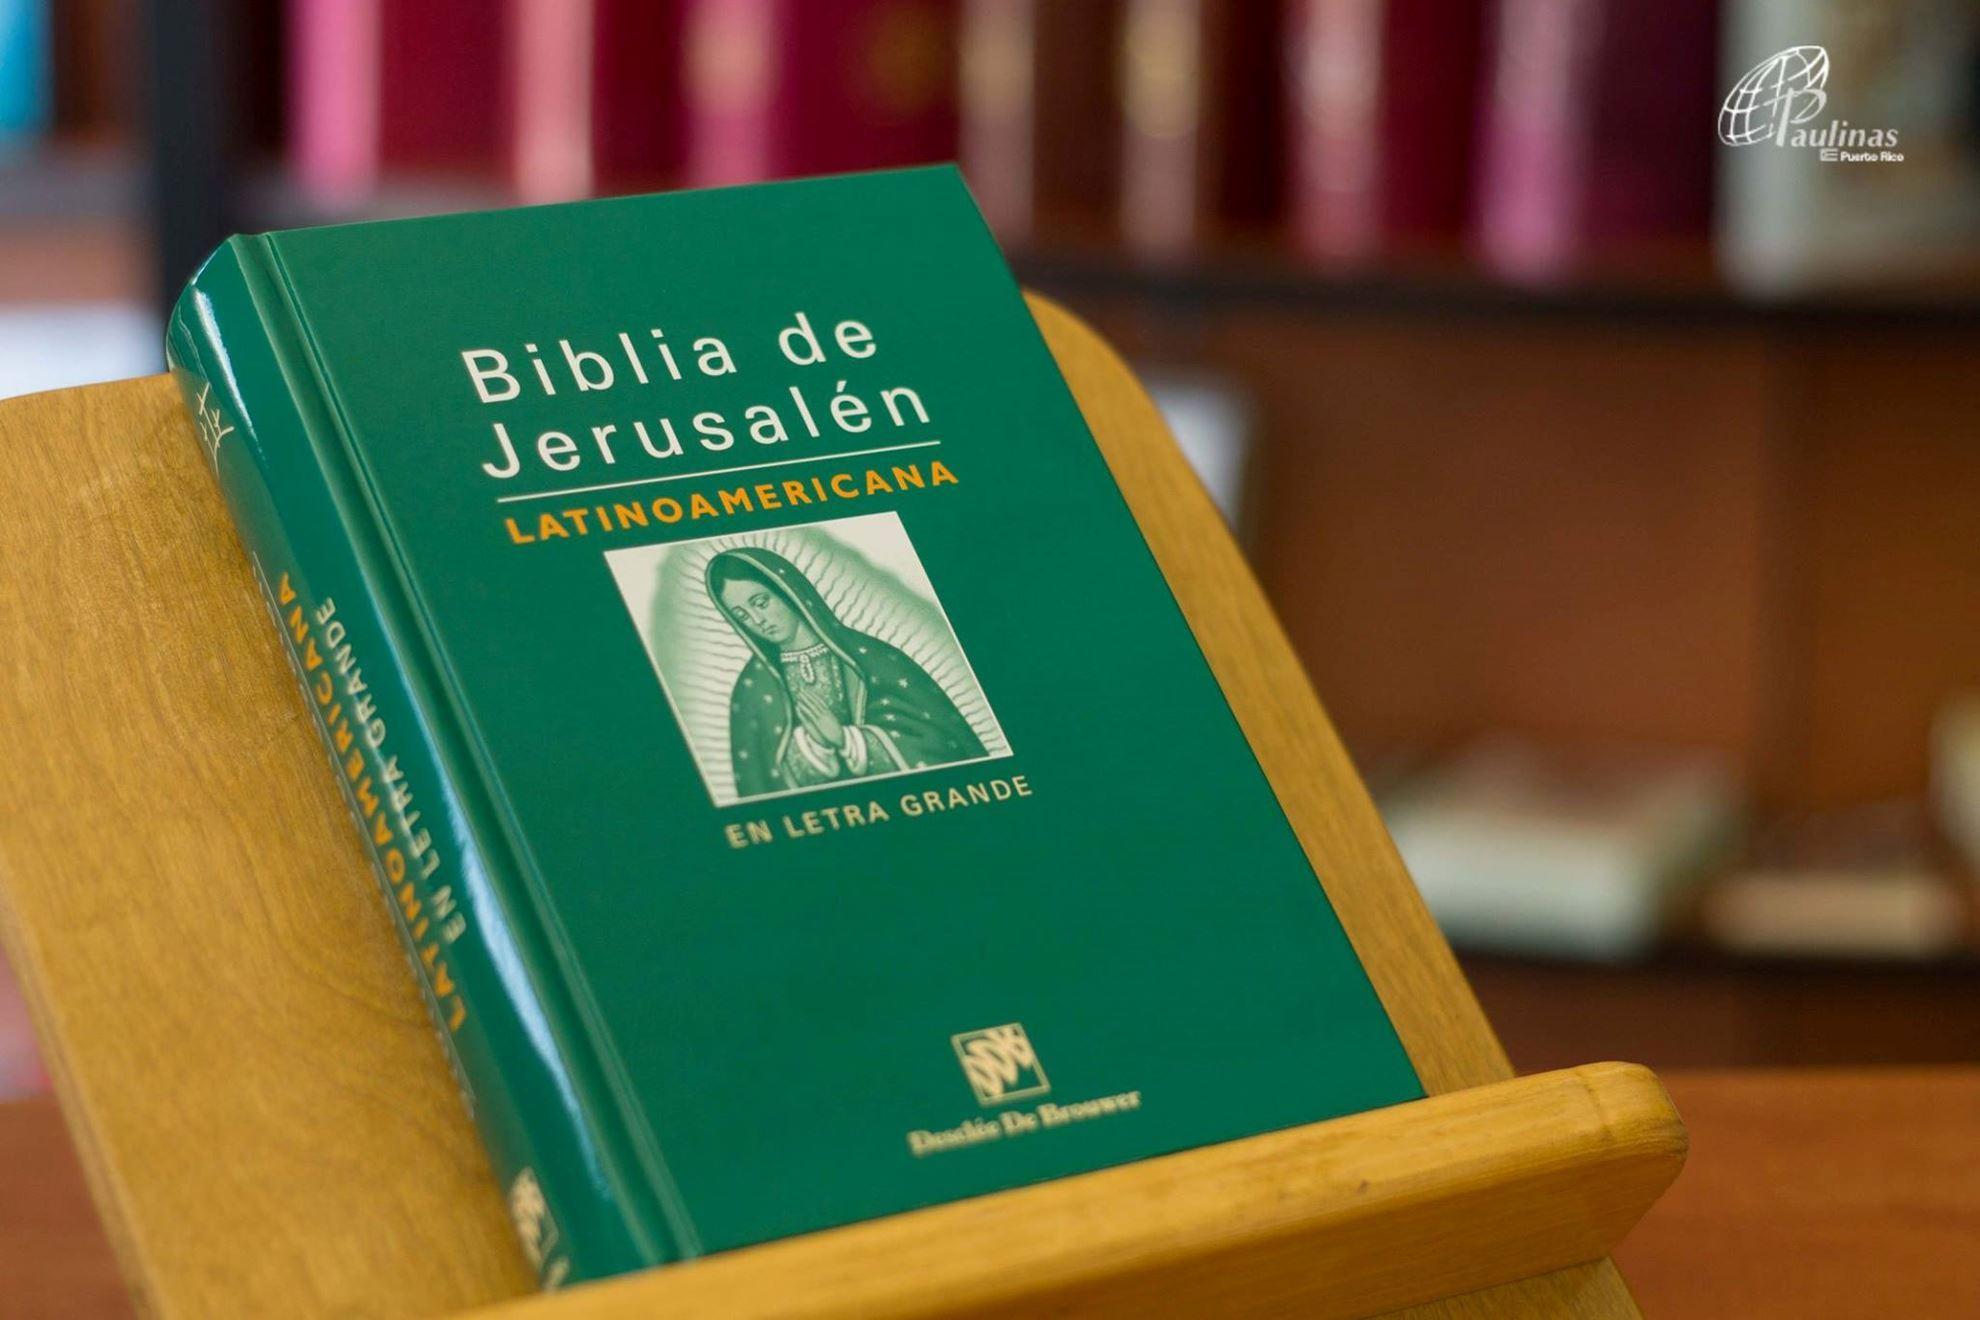 BIBLIA DE JERUSALEN LATINOAMERICANA (LETRA GRANDE)